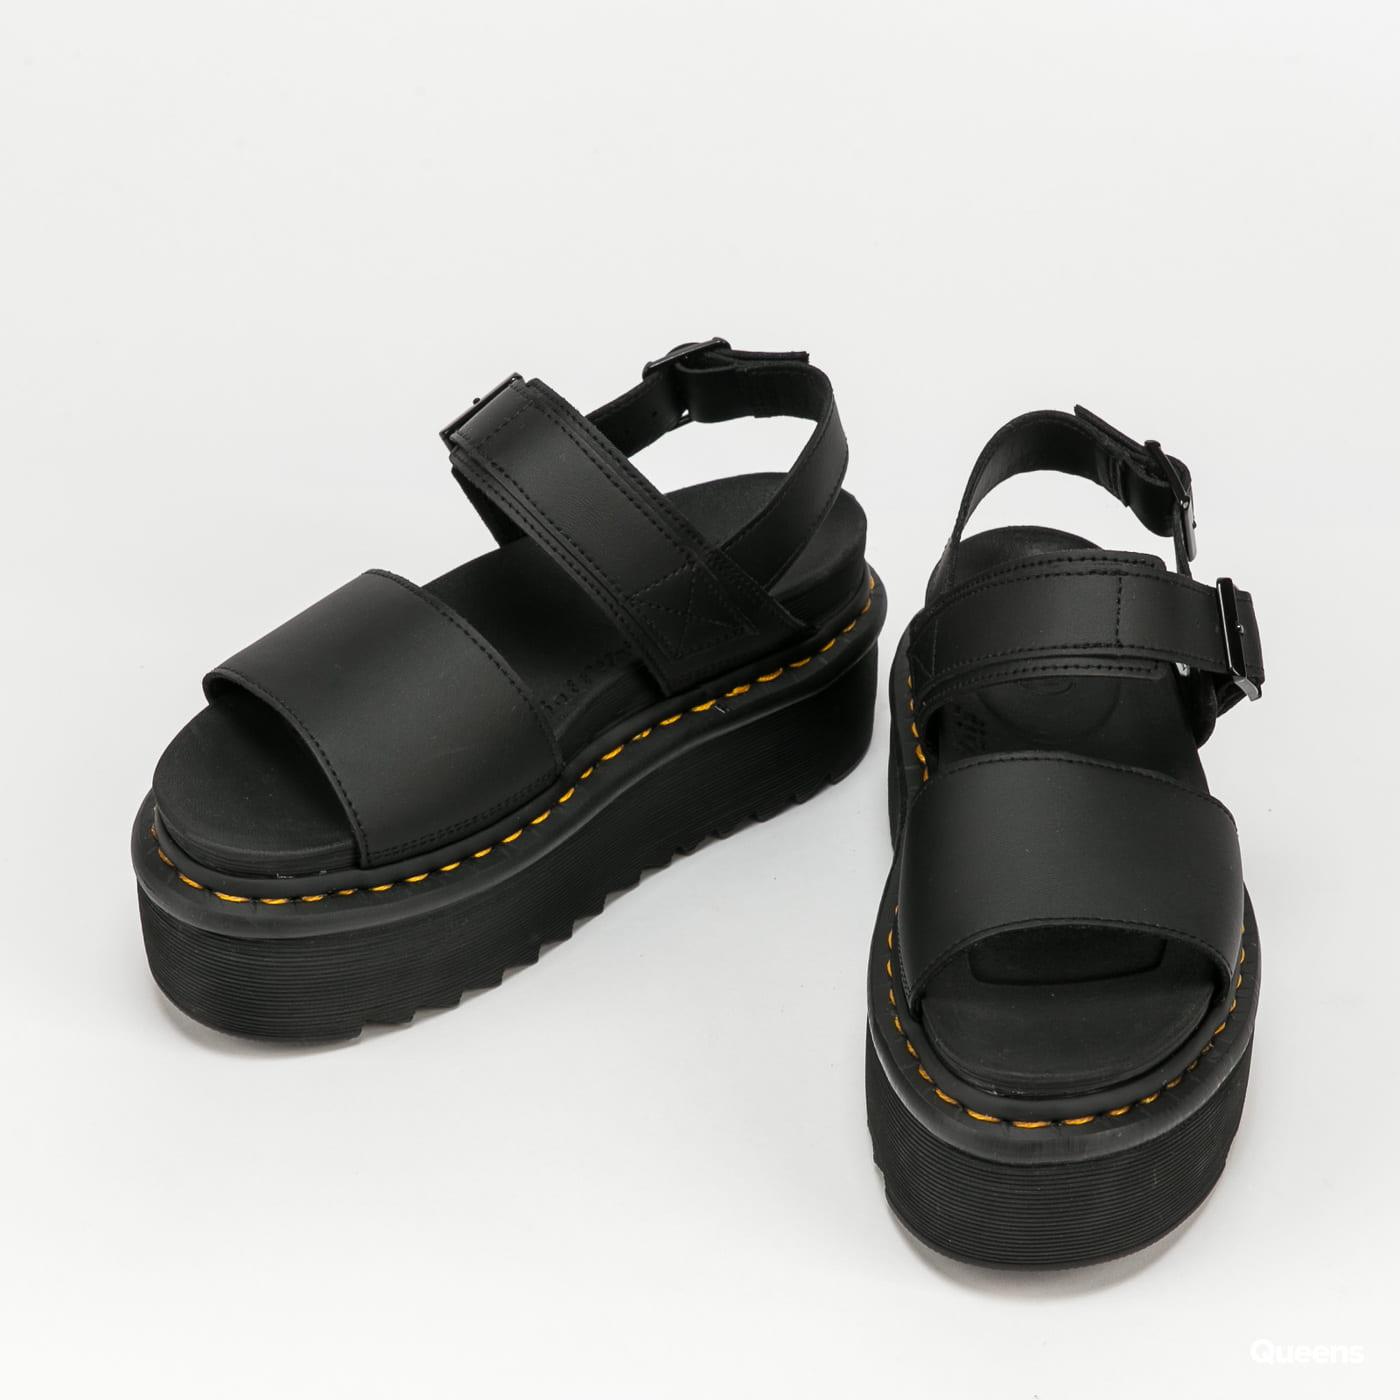 Dr. Martens Voss Quad black hydro leather